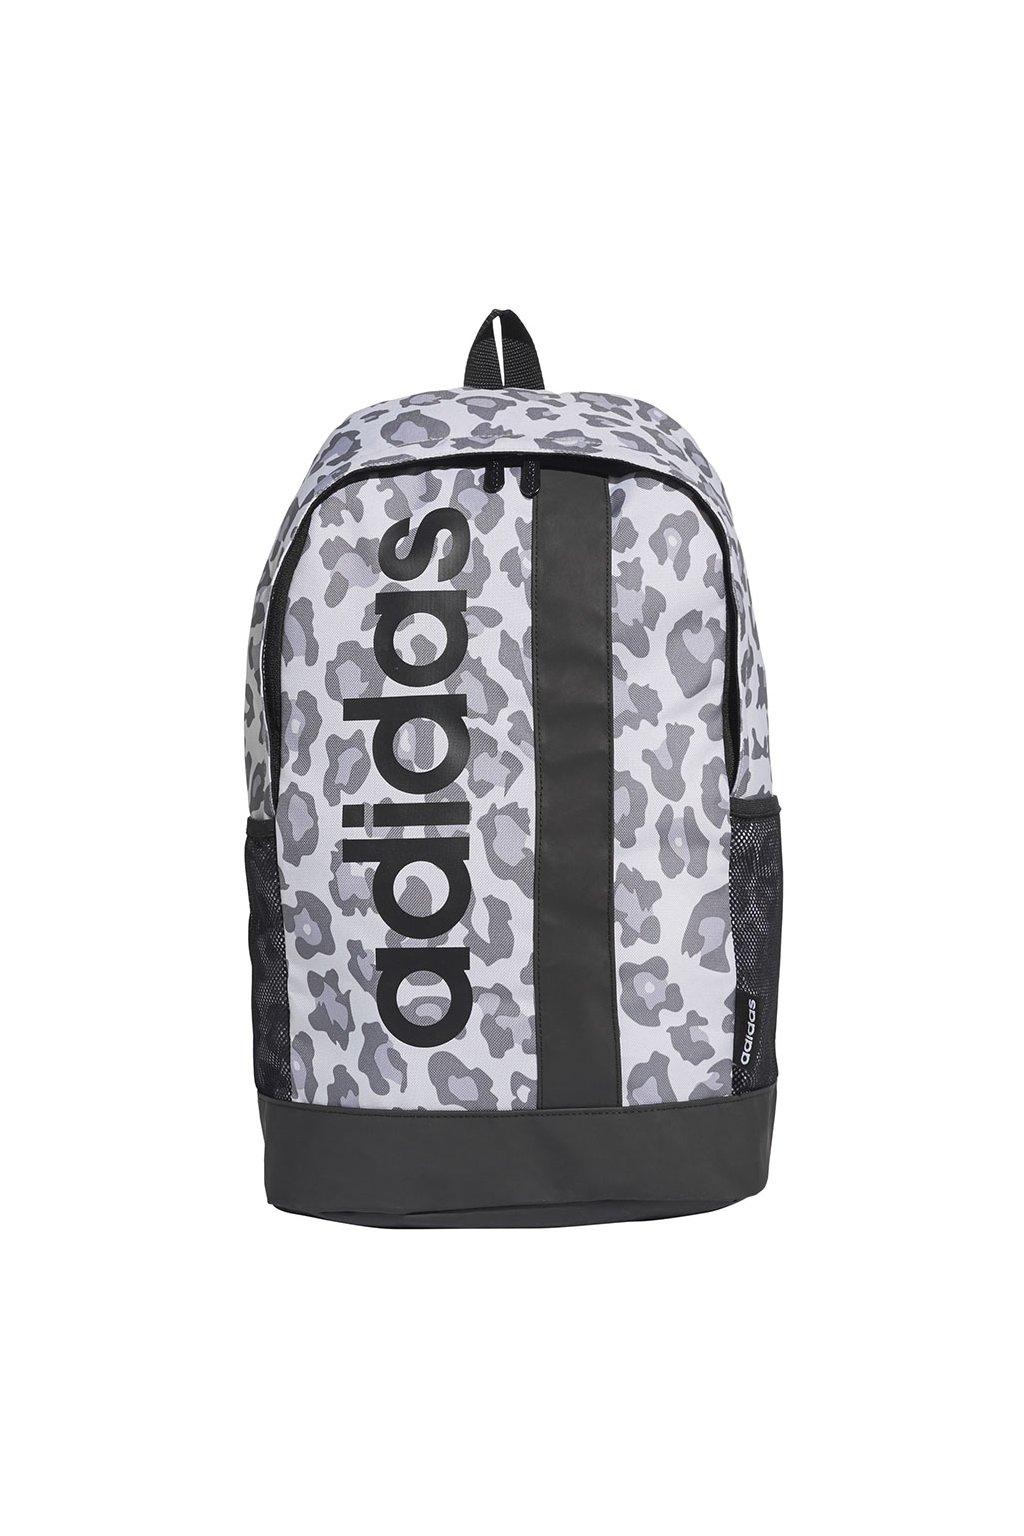 Batoh adidas Linear Backpack Leopard šedý GE1230